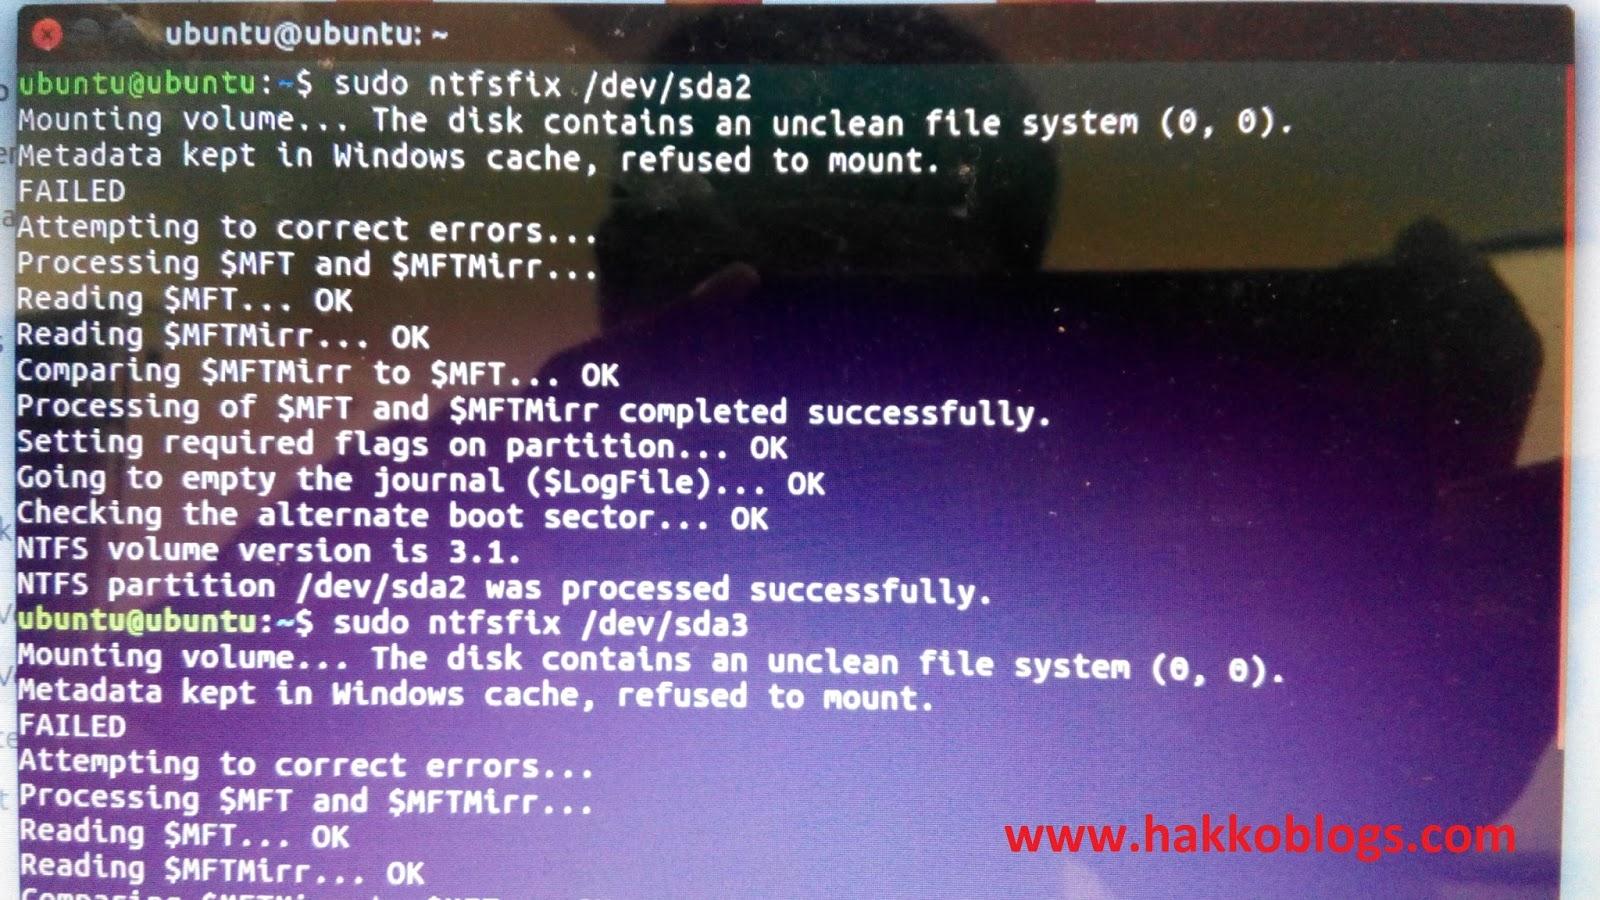 Windows failed to resume from hibernate with error status